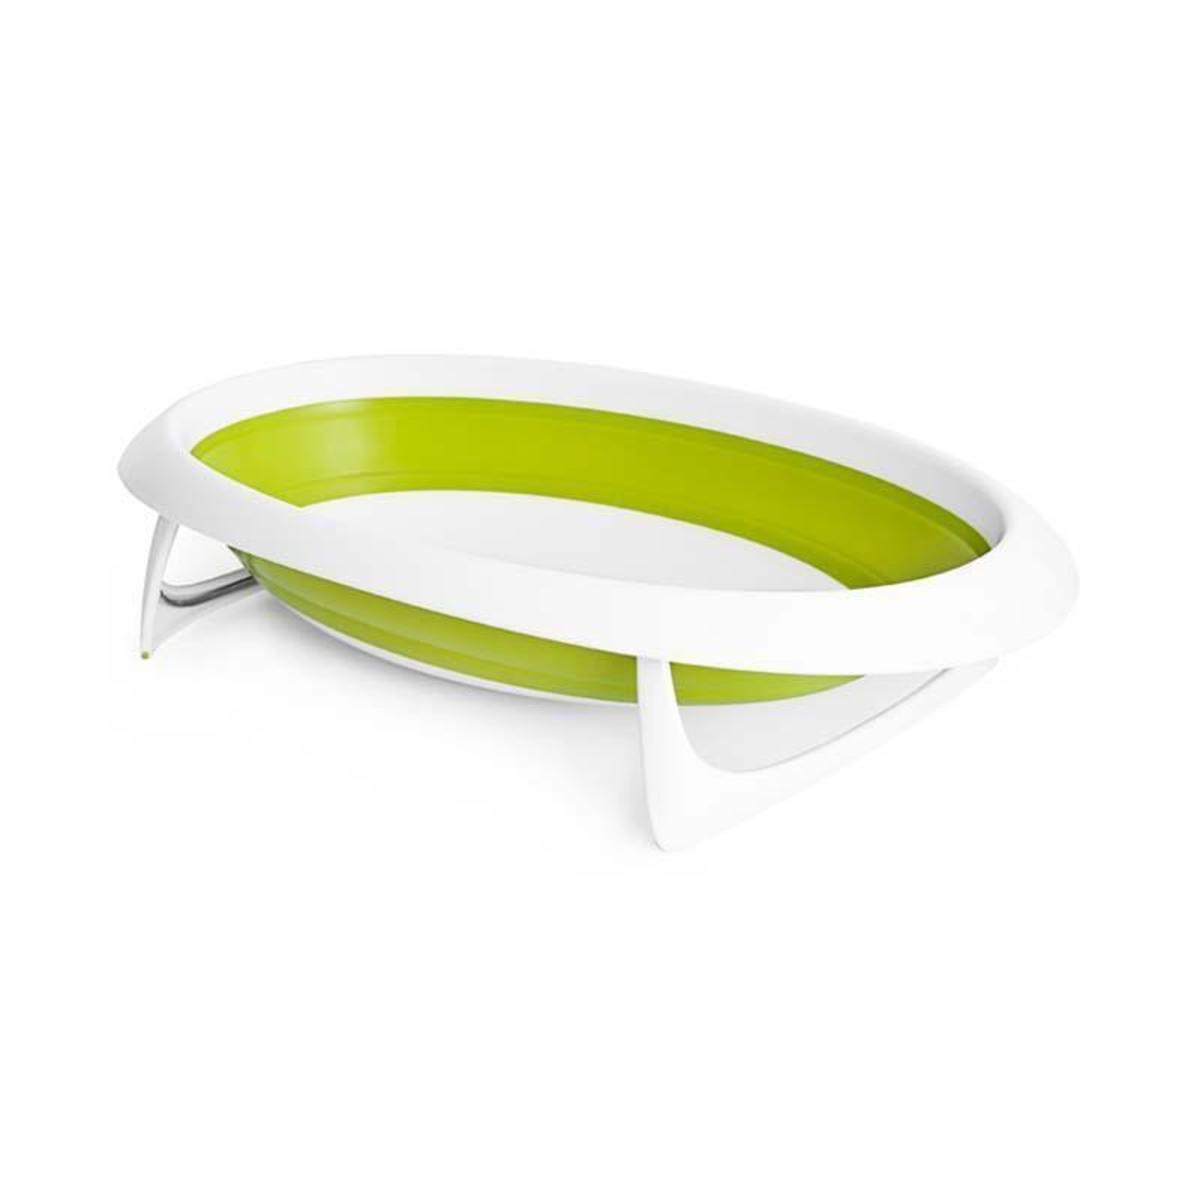 Boon NAKED Folding Bathtub (2 colors) - Green